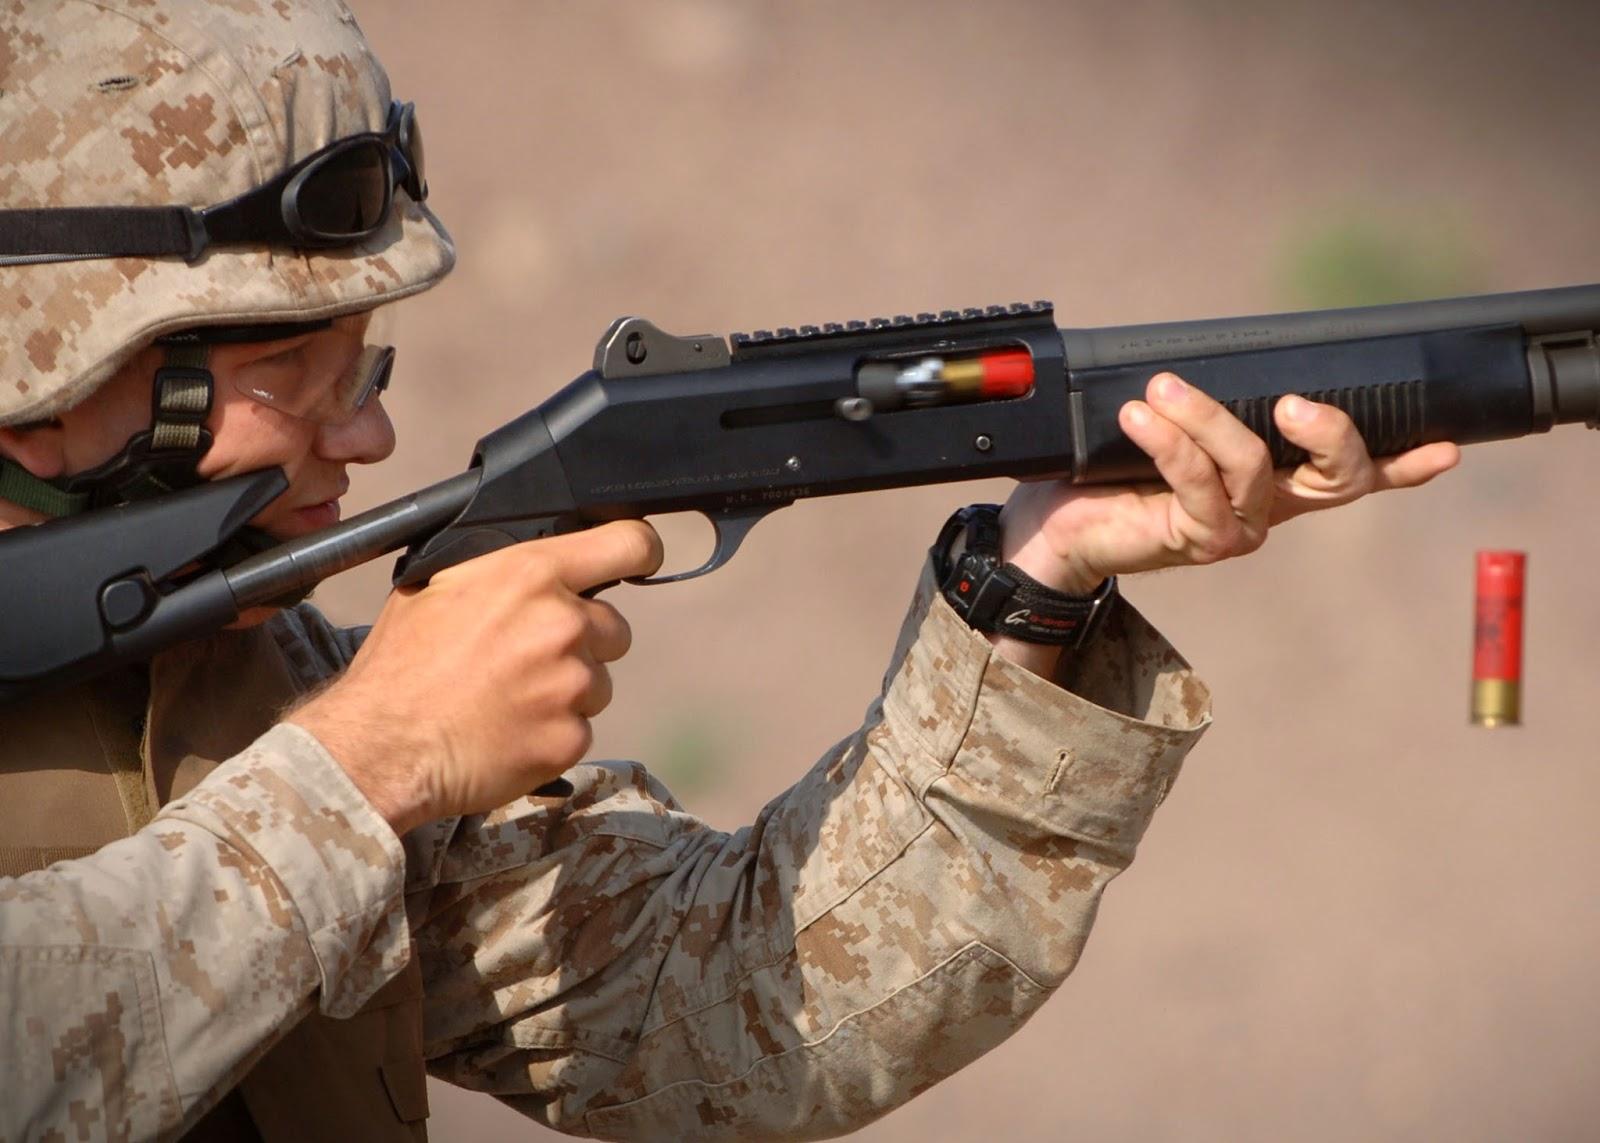 12 Gauge Pump Action Shotguns